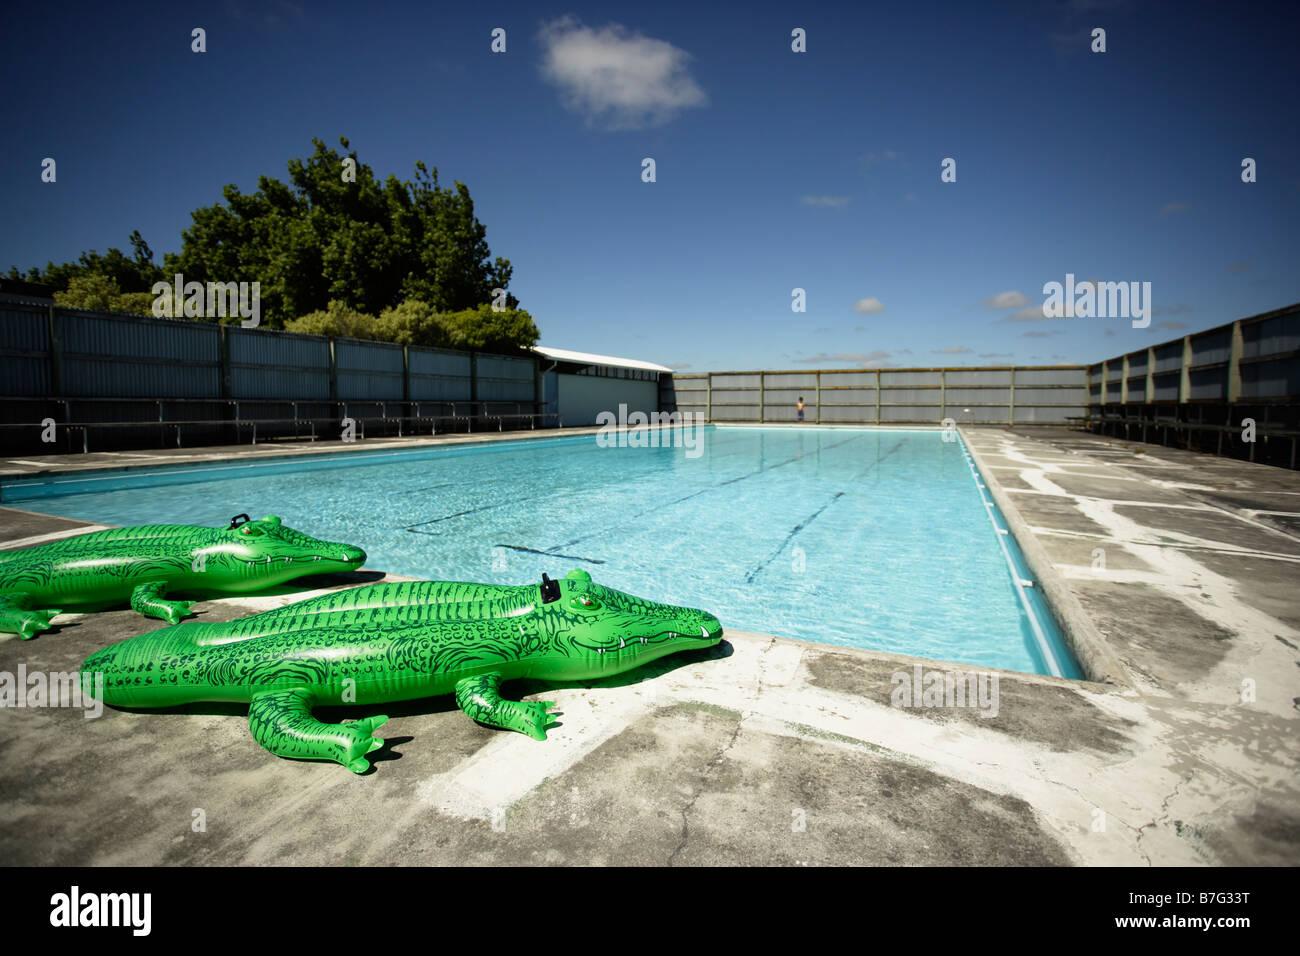 Inflatable crocodile at swimming pool - Stock Image